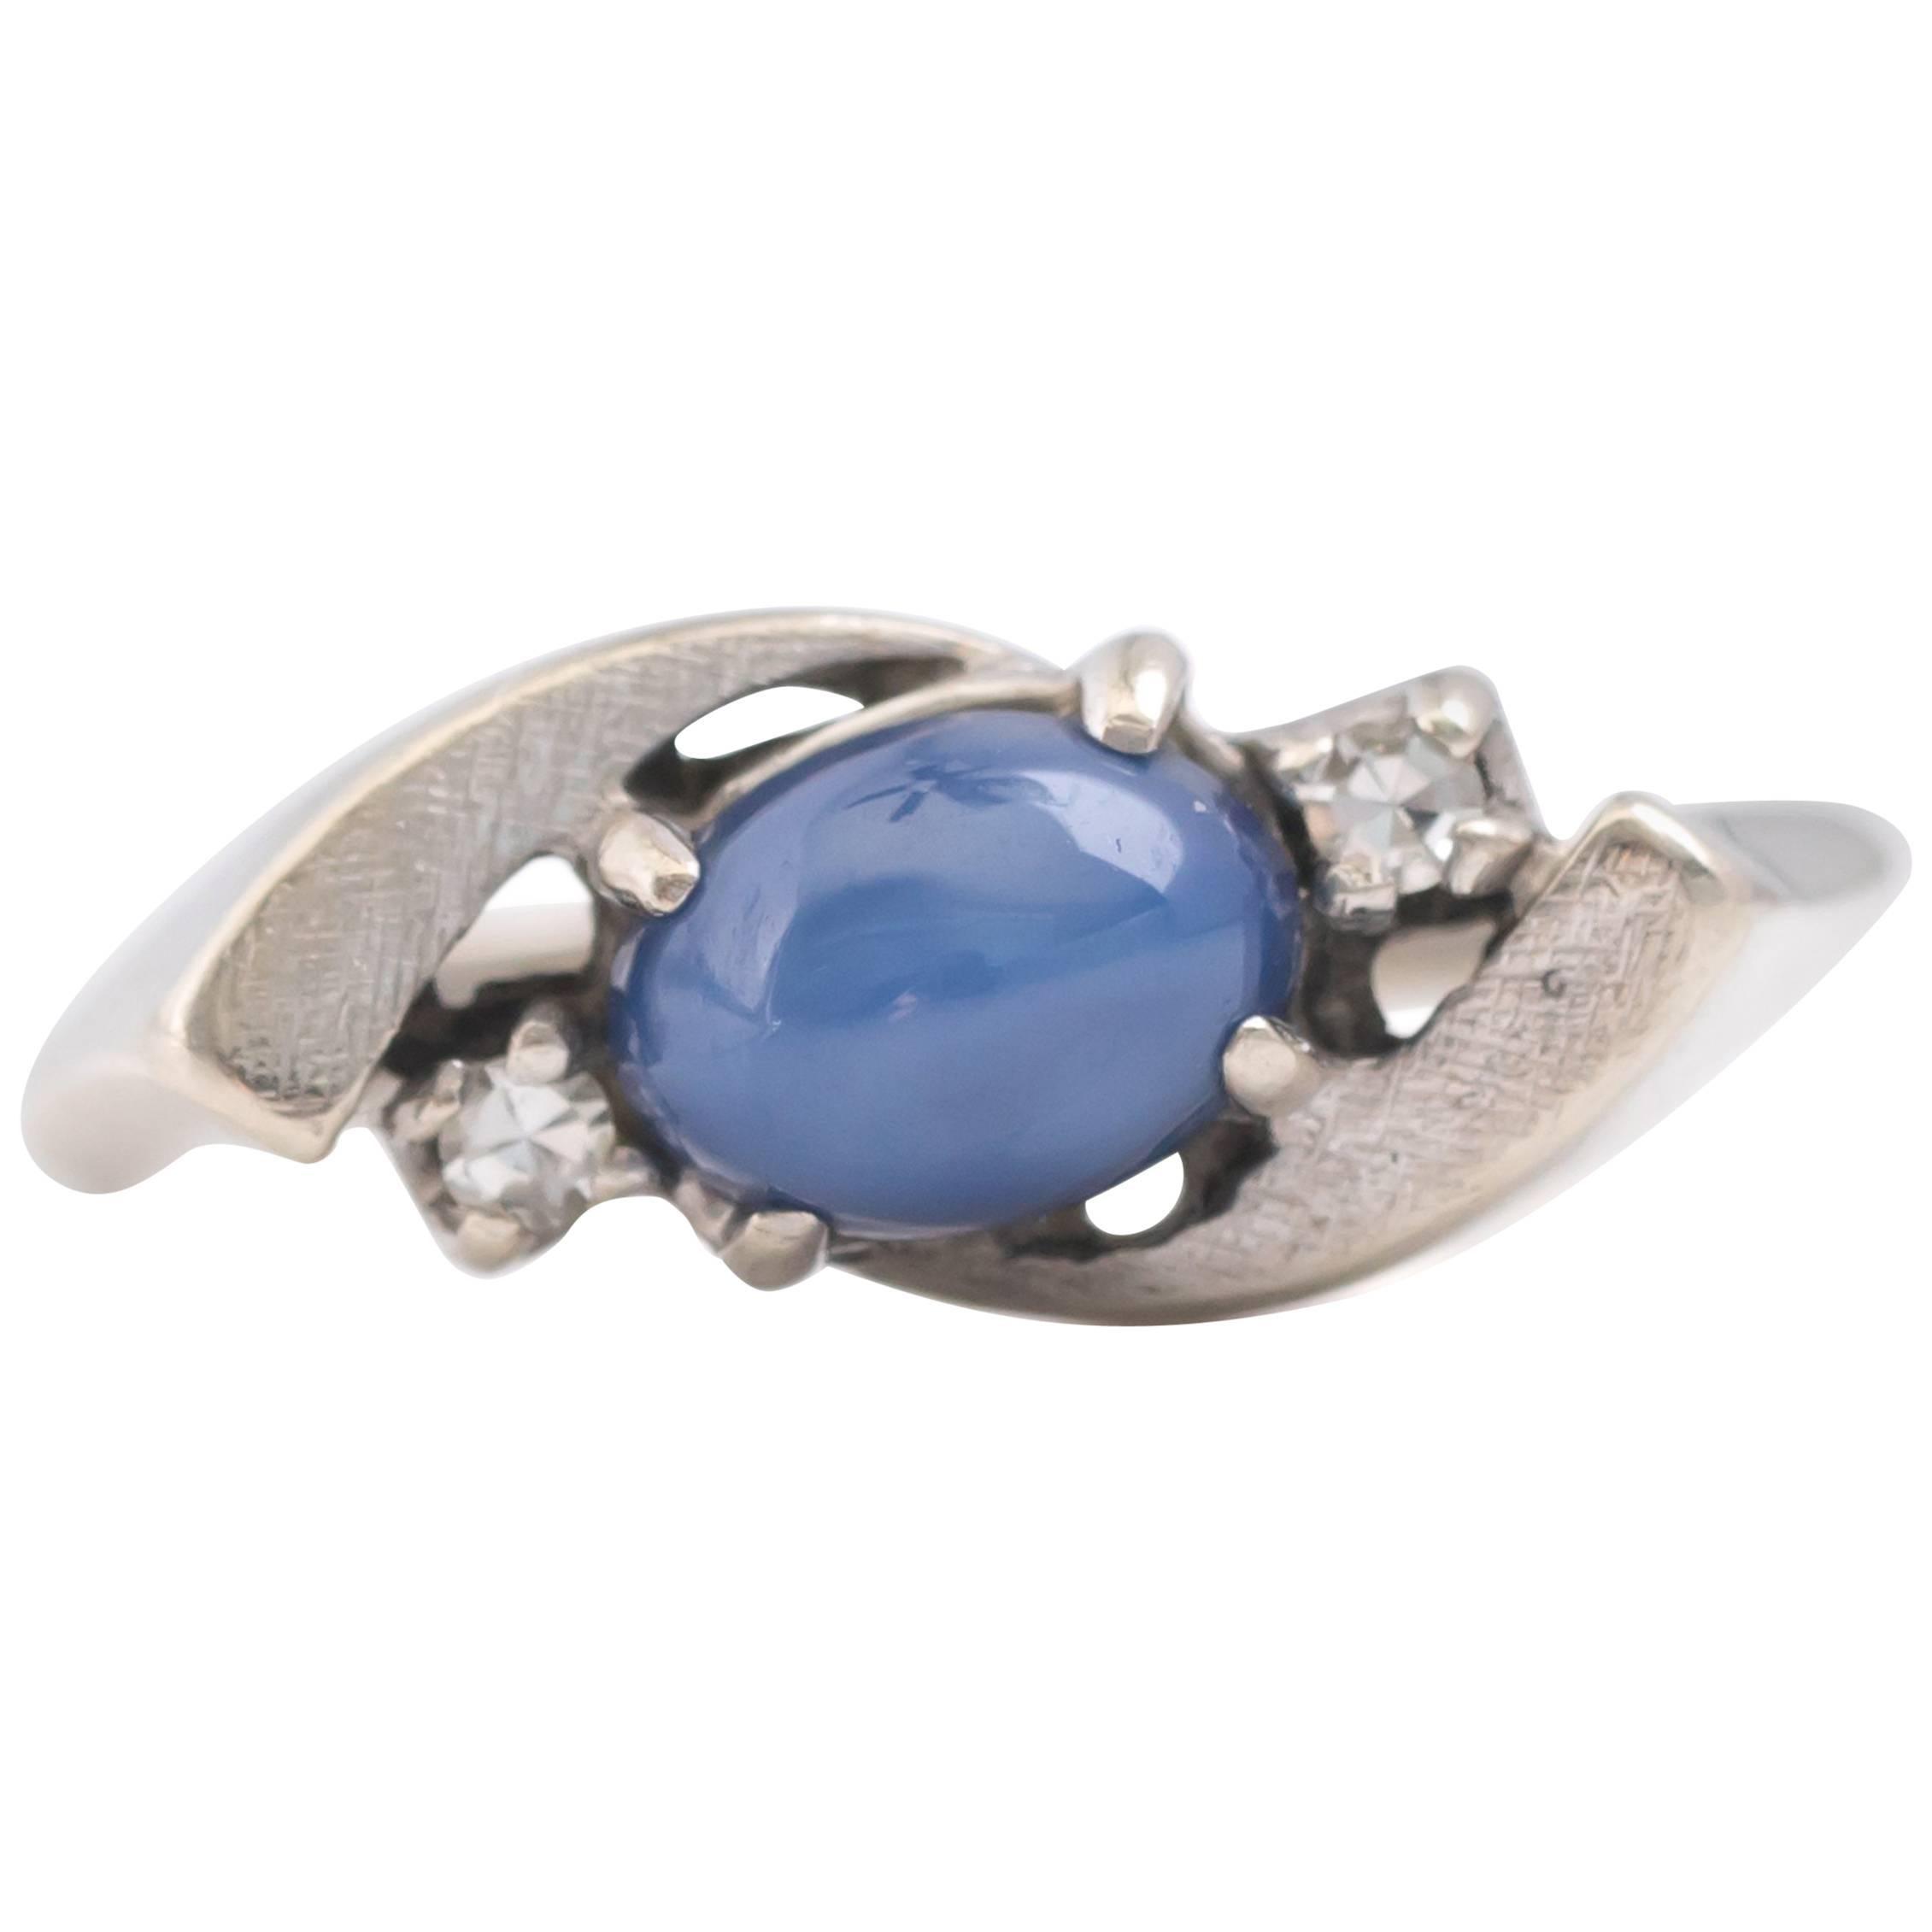 14 kt White Gold Radiant Cut 1.25 ct Blue Sapphire Pendant